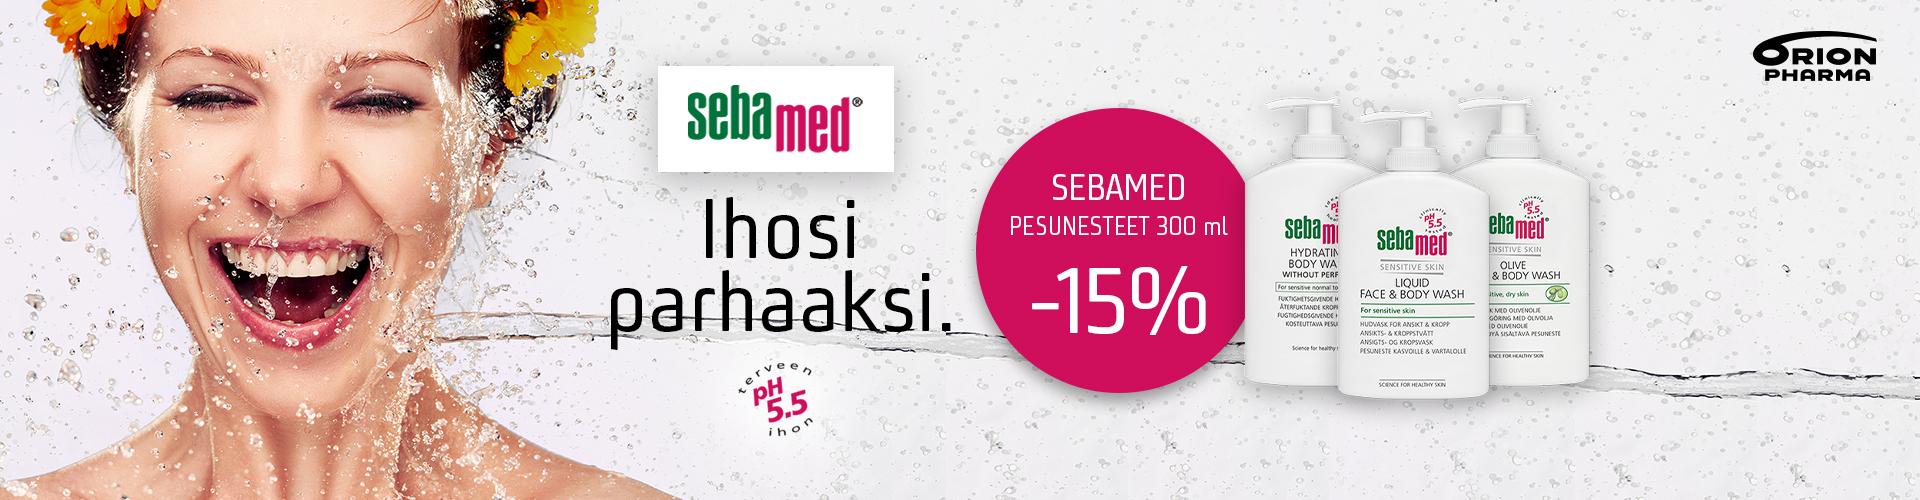 https://kauppa.tervahovinapteekki.fi/fi/catalogsearch/result/index/?p=2&q=sebamed+